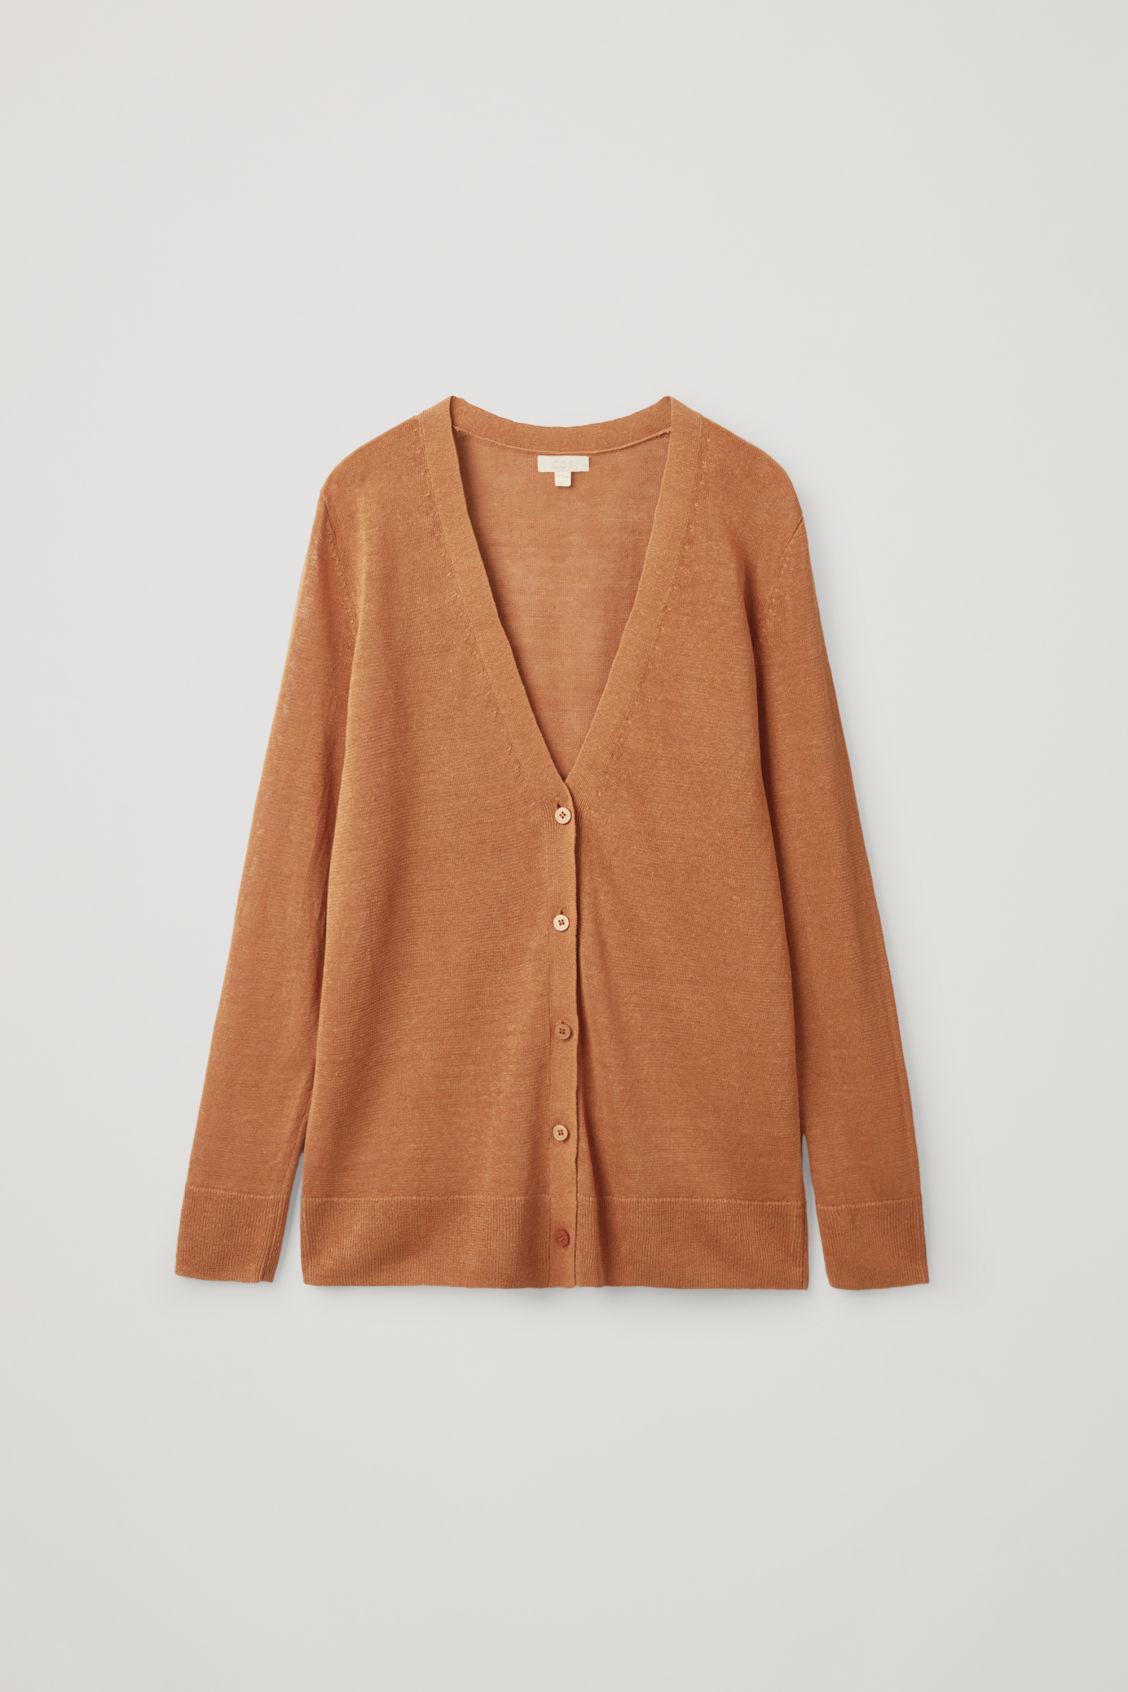 Cos Linen-mulberry Silk Cardigan In Orange